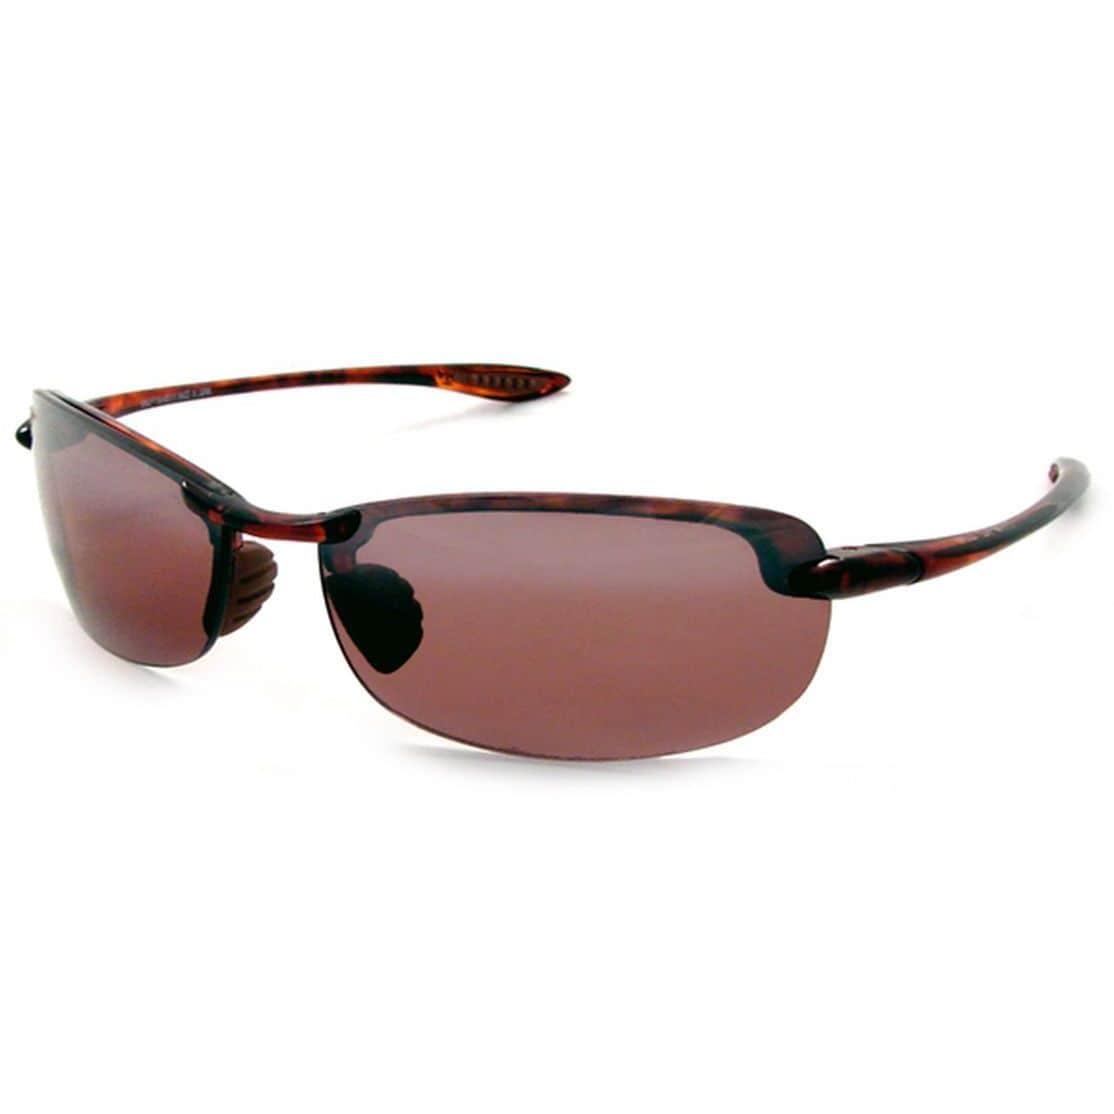 d2a8d9665bb Shop Maui Jim Unisex Makaha Sport Fashion Sunglasses - Free Shipping Today  - Overstock - 9662343